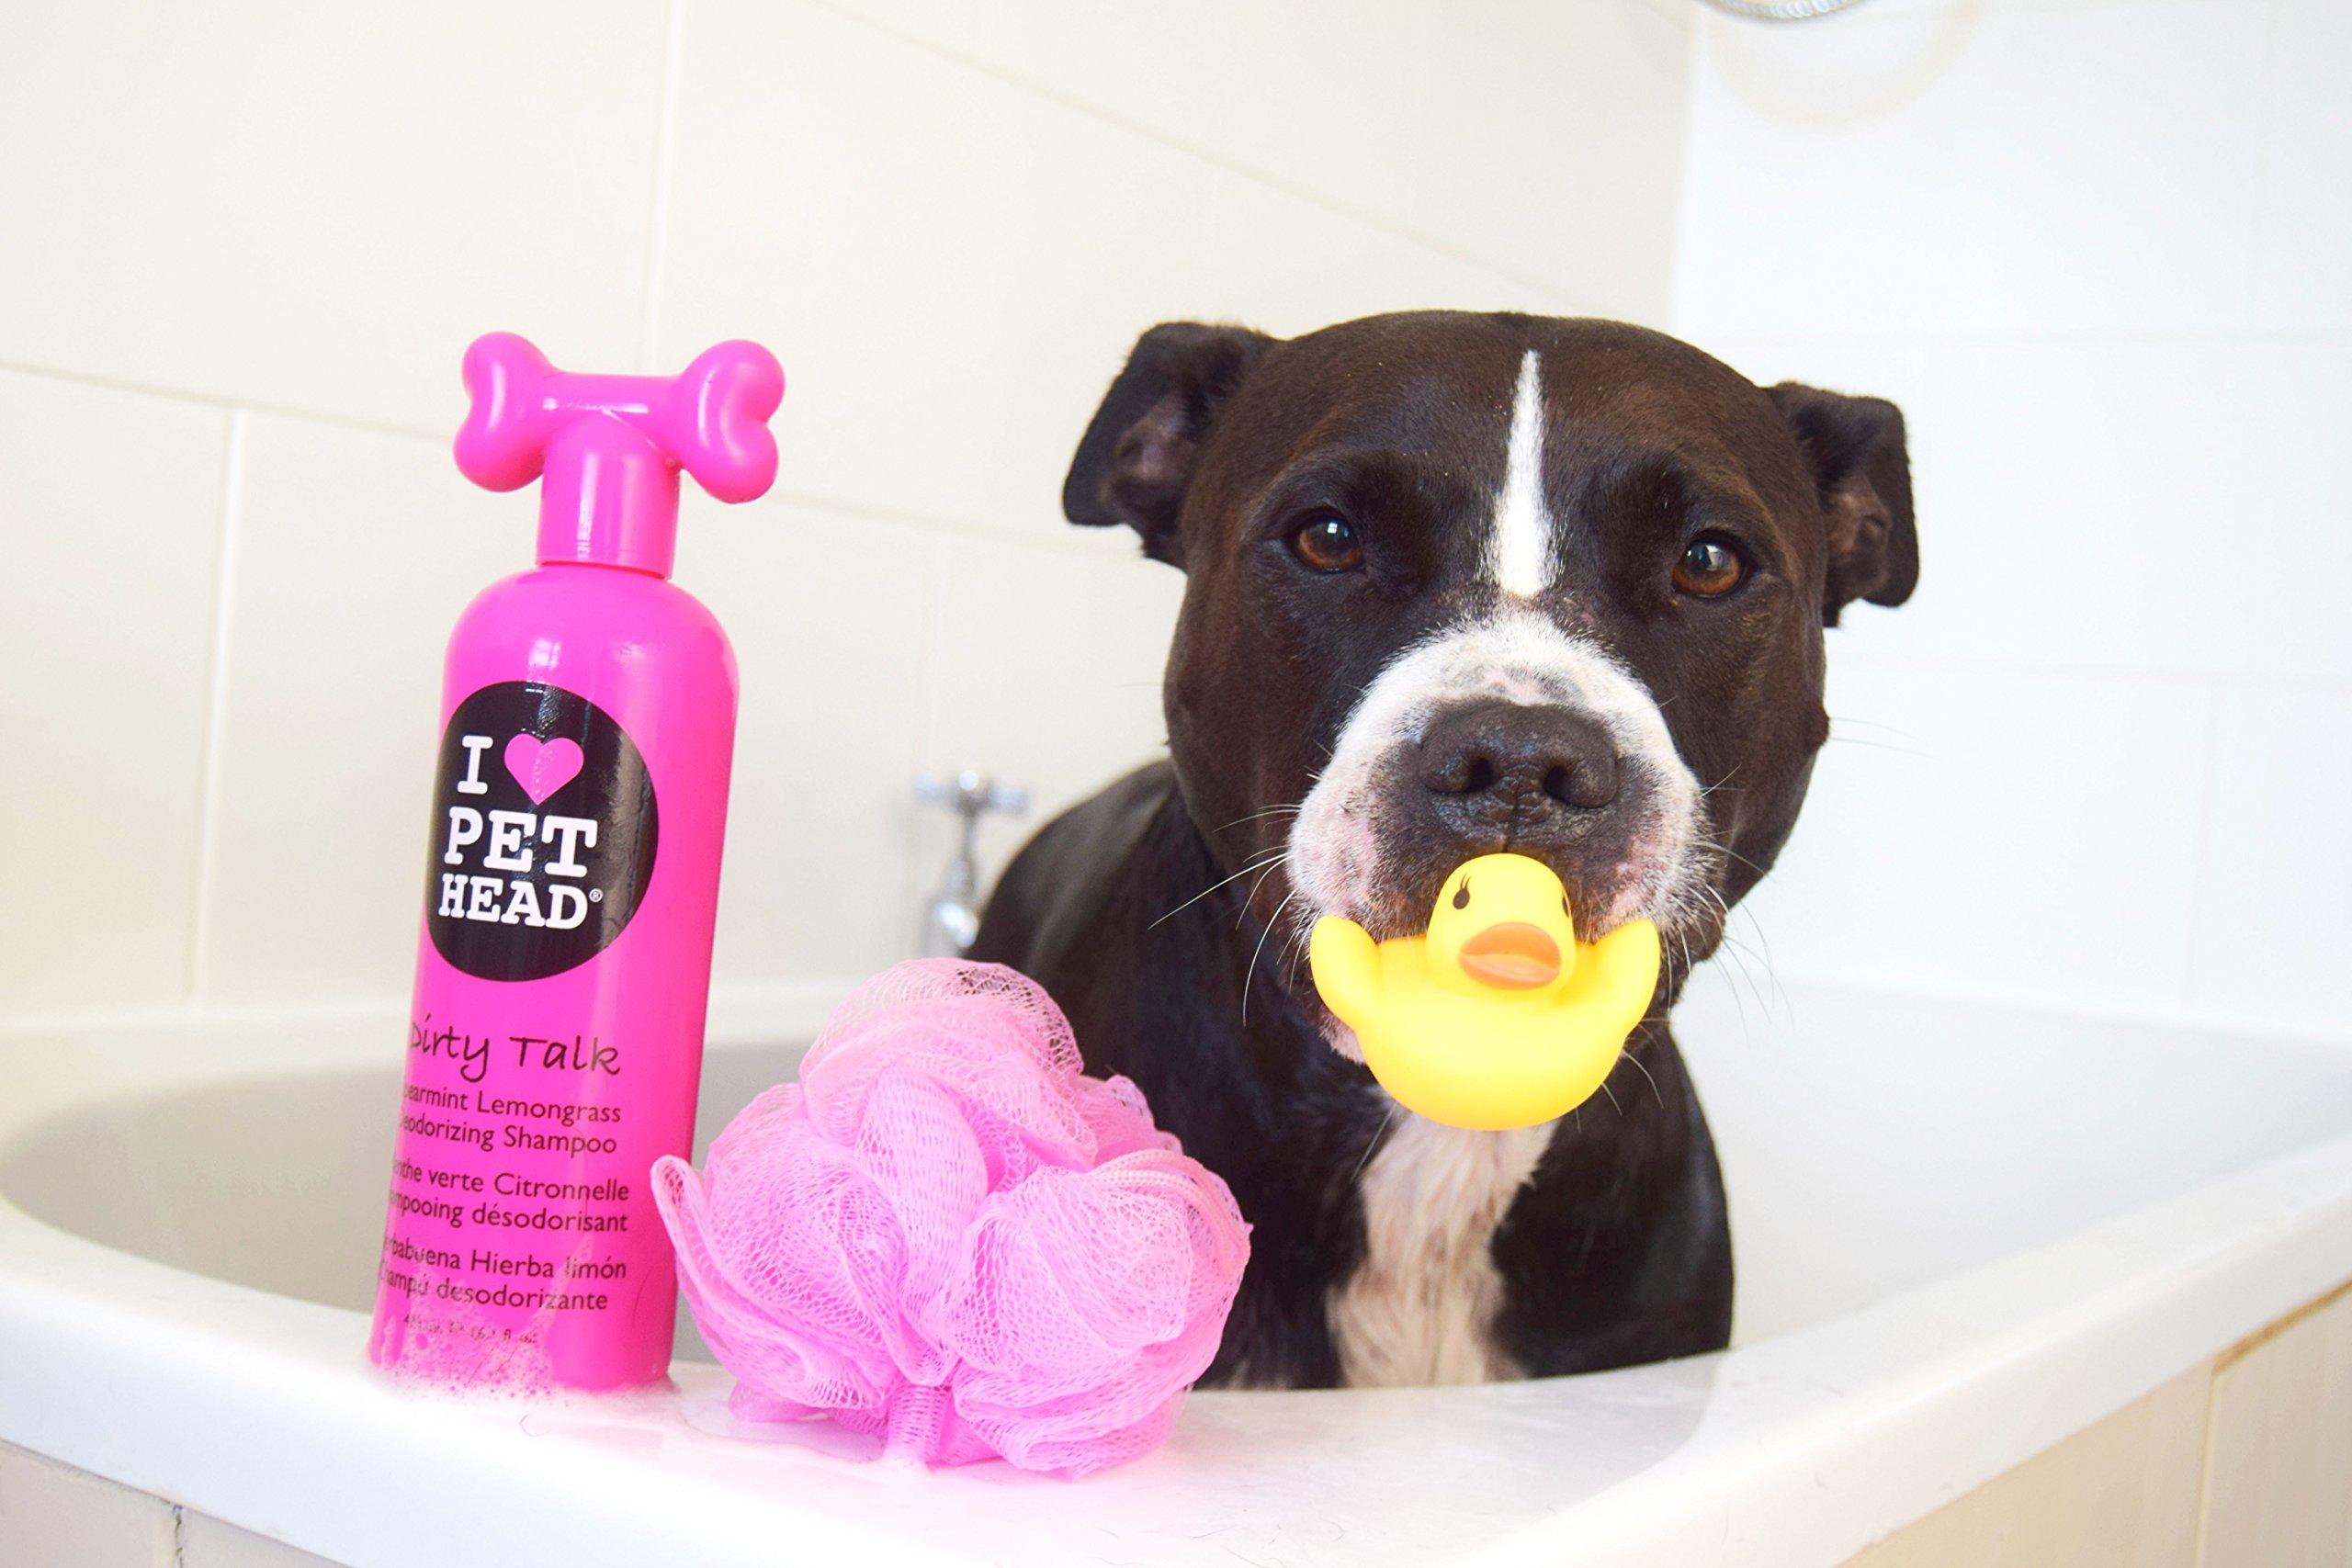 Pet Head Fur Ball Detangling Spray for Pets Strawberry Yogurt -- 15.2 fl oz by The Company of Animals (Image #4)